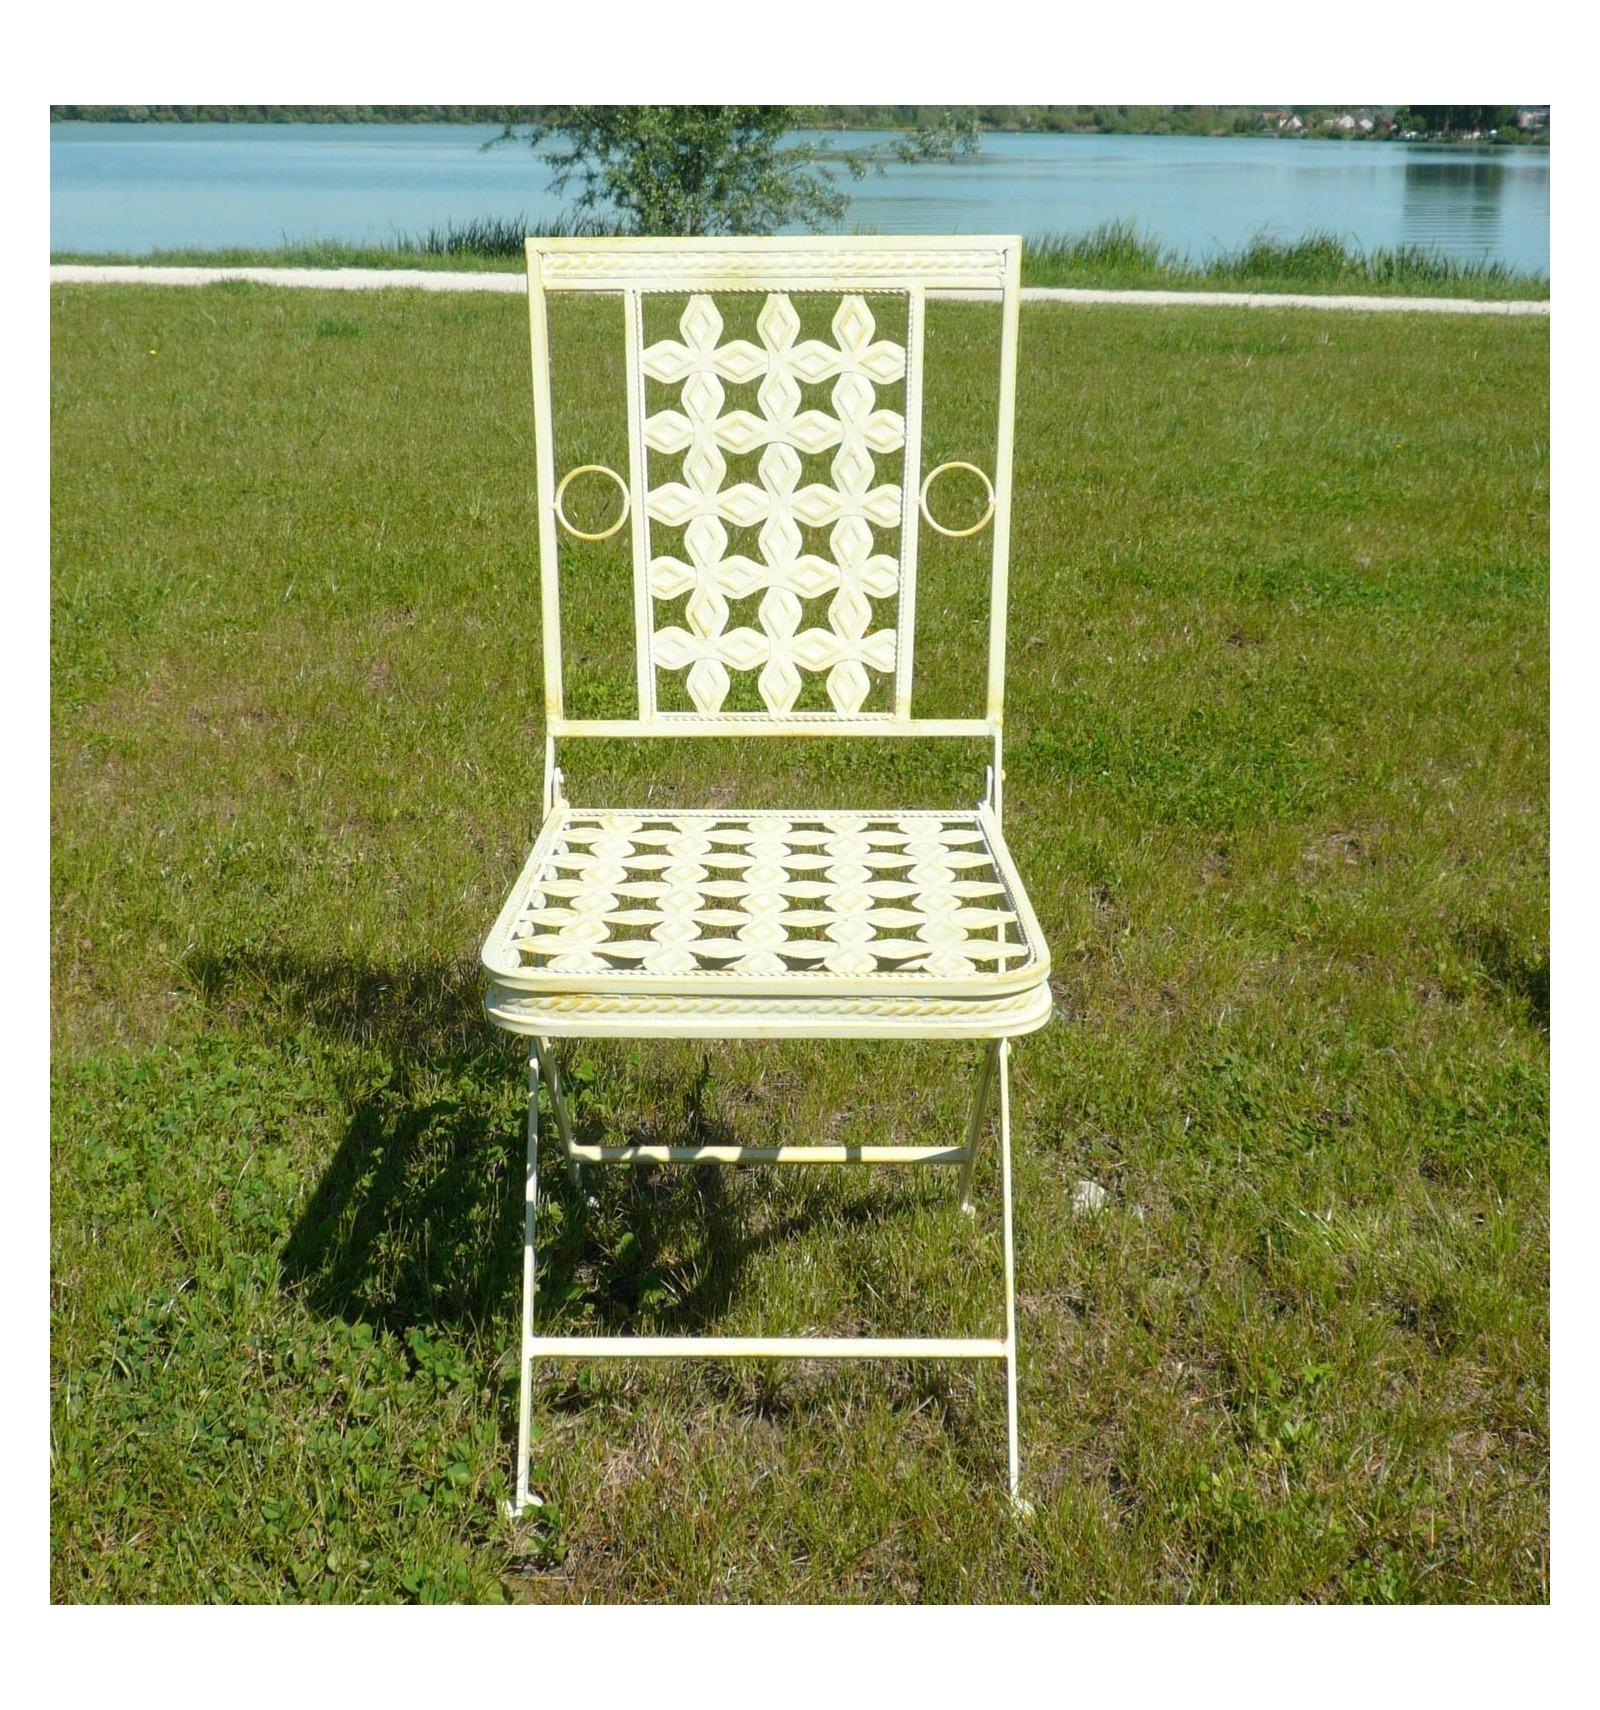 Mobili da giardino in ferro battuto tavoli sedie for Mobili da giardino in ferro antichi